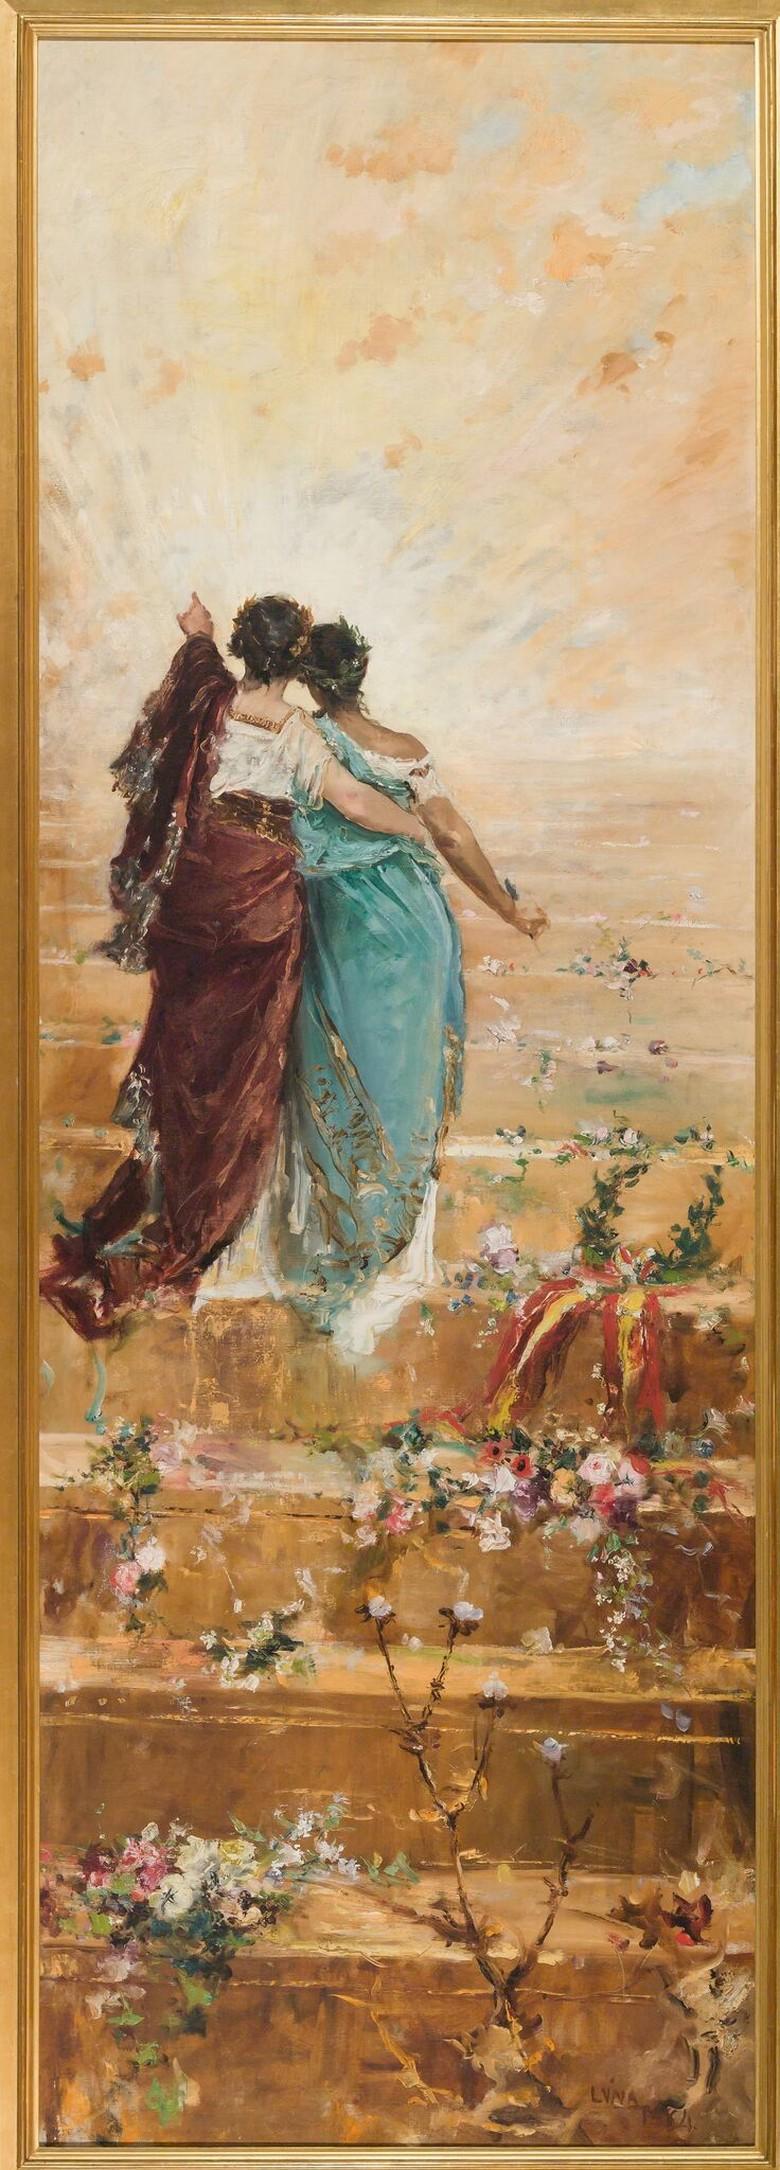 Lukisan Masterpiece Raden Saleh hingga Monet akan Sambangi Singapura